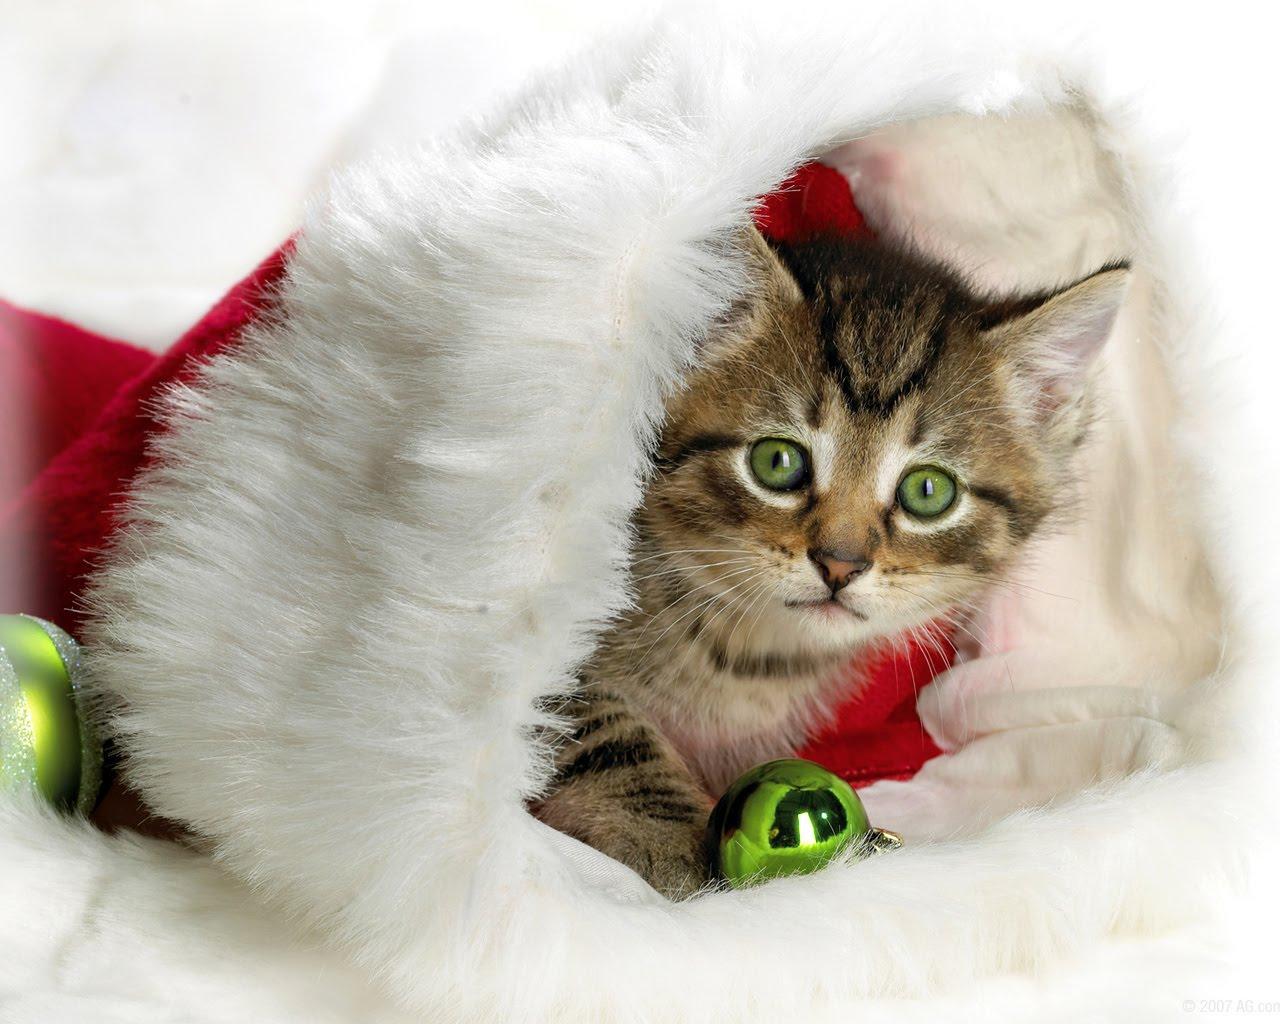 http://2.bp.blogspot.com/_SWYwL3fIkFs/S71VSdIBqxI/AAAAAAAAEFE/wMsHbOXSpBQ/s1600/cat+christmas+hat.jpg